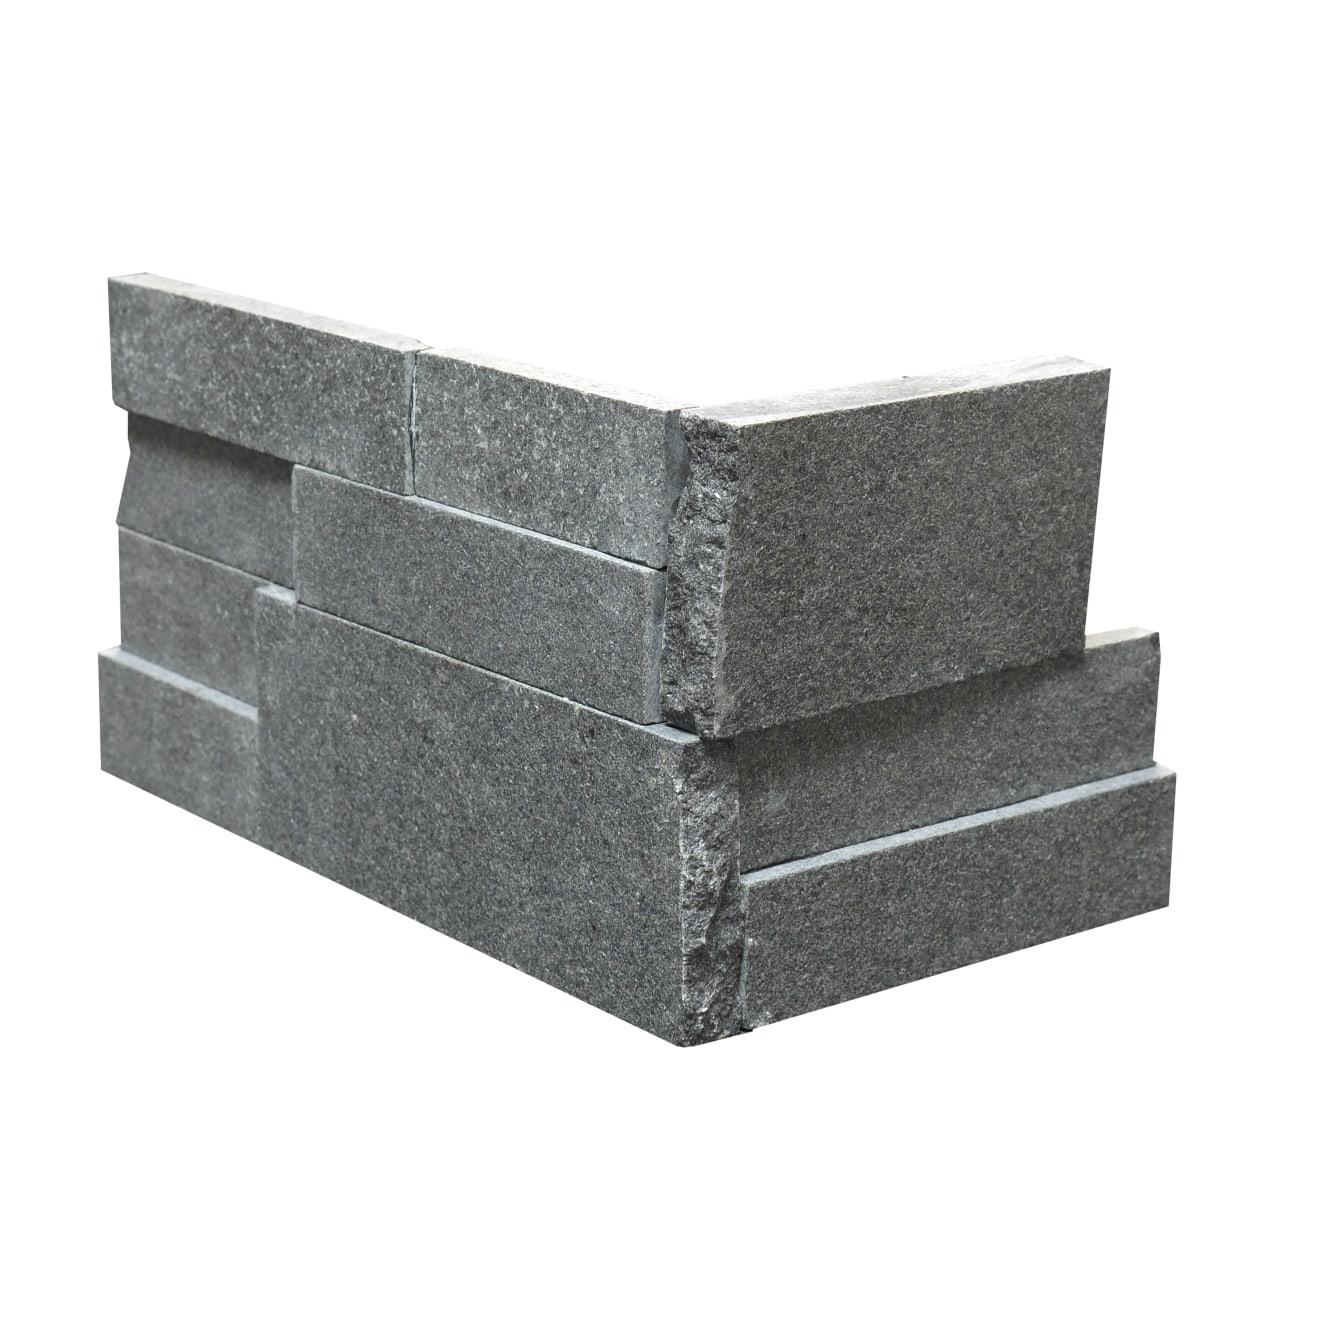 "Absolute Black 6"" x 24"" Flamed Granite Ledger Corner"